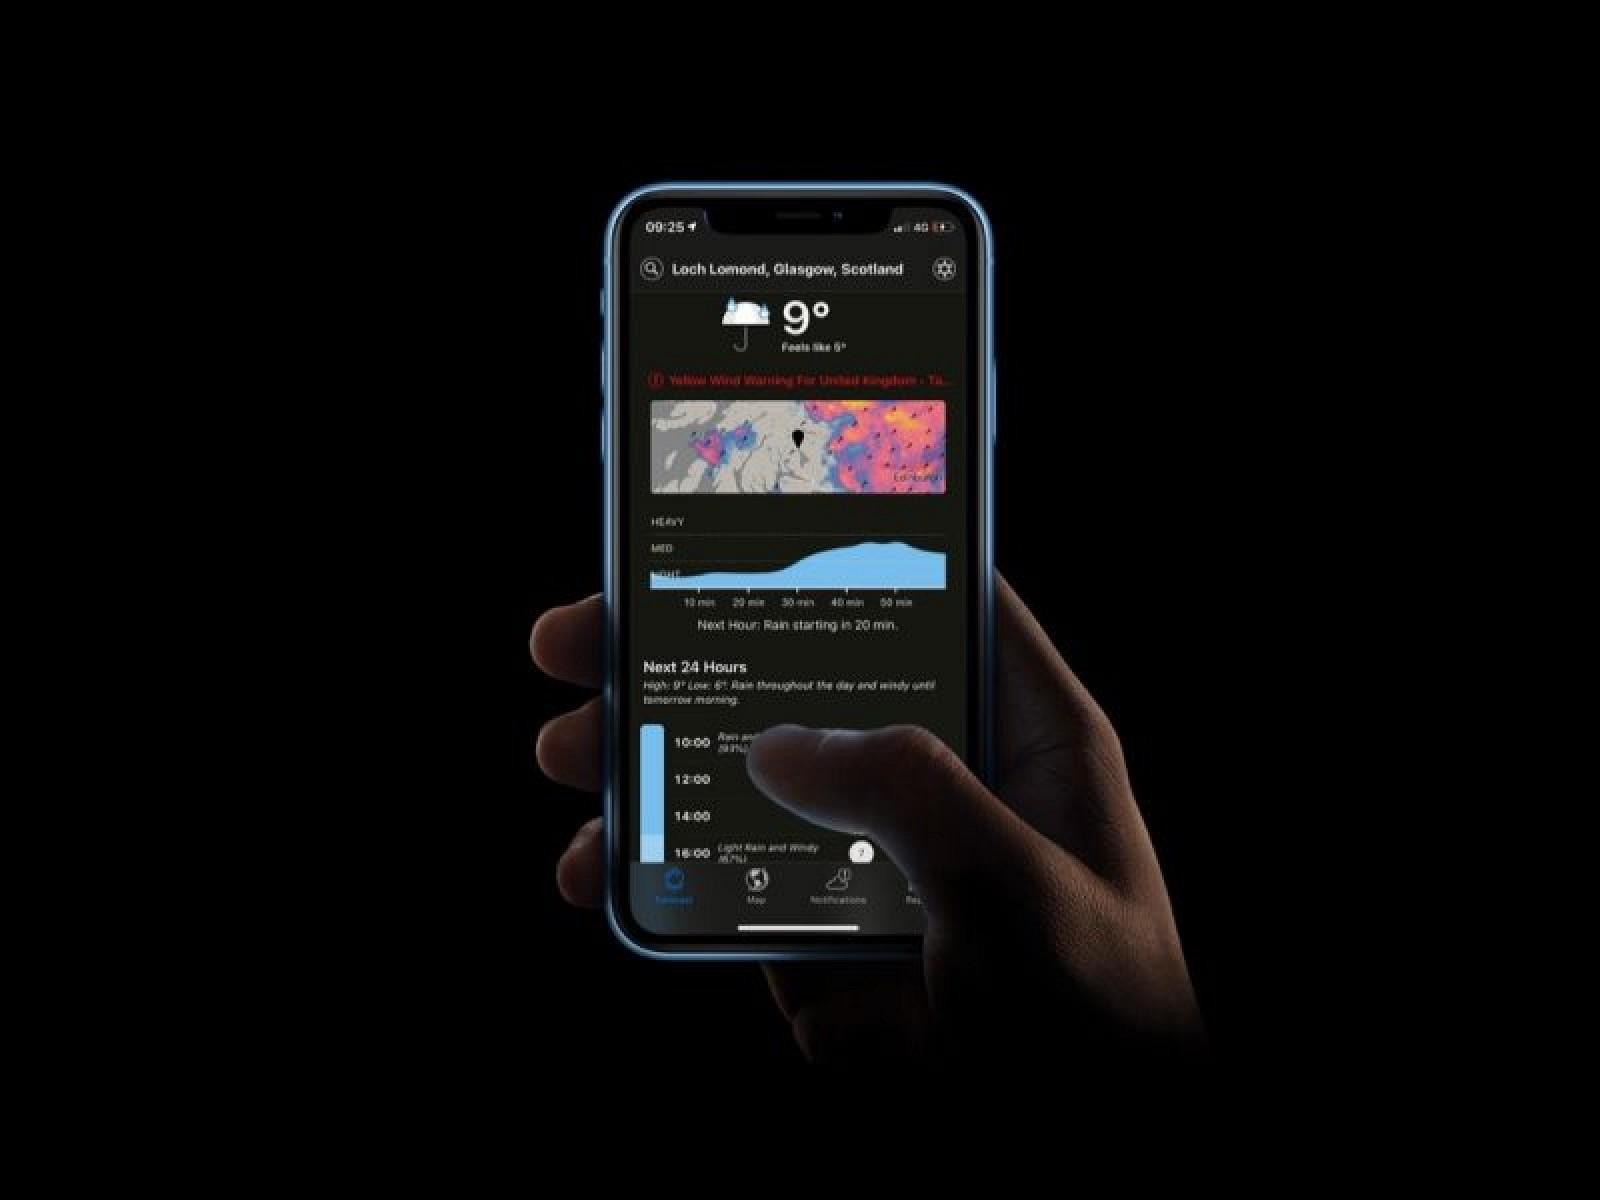 Popular Weather App 'Dark Sky' Gains Dark Mode